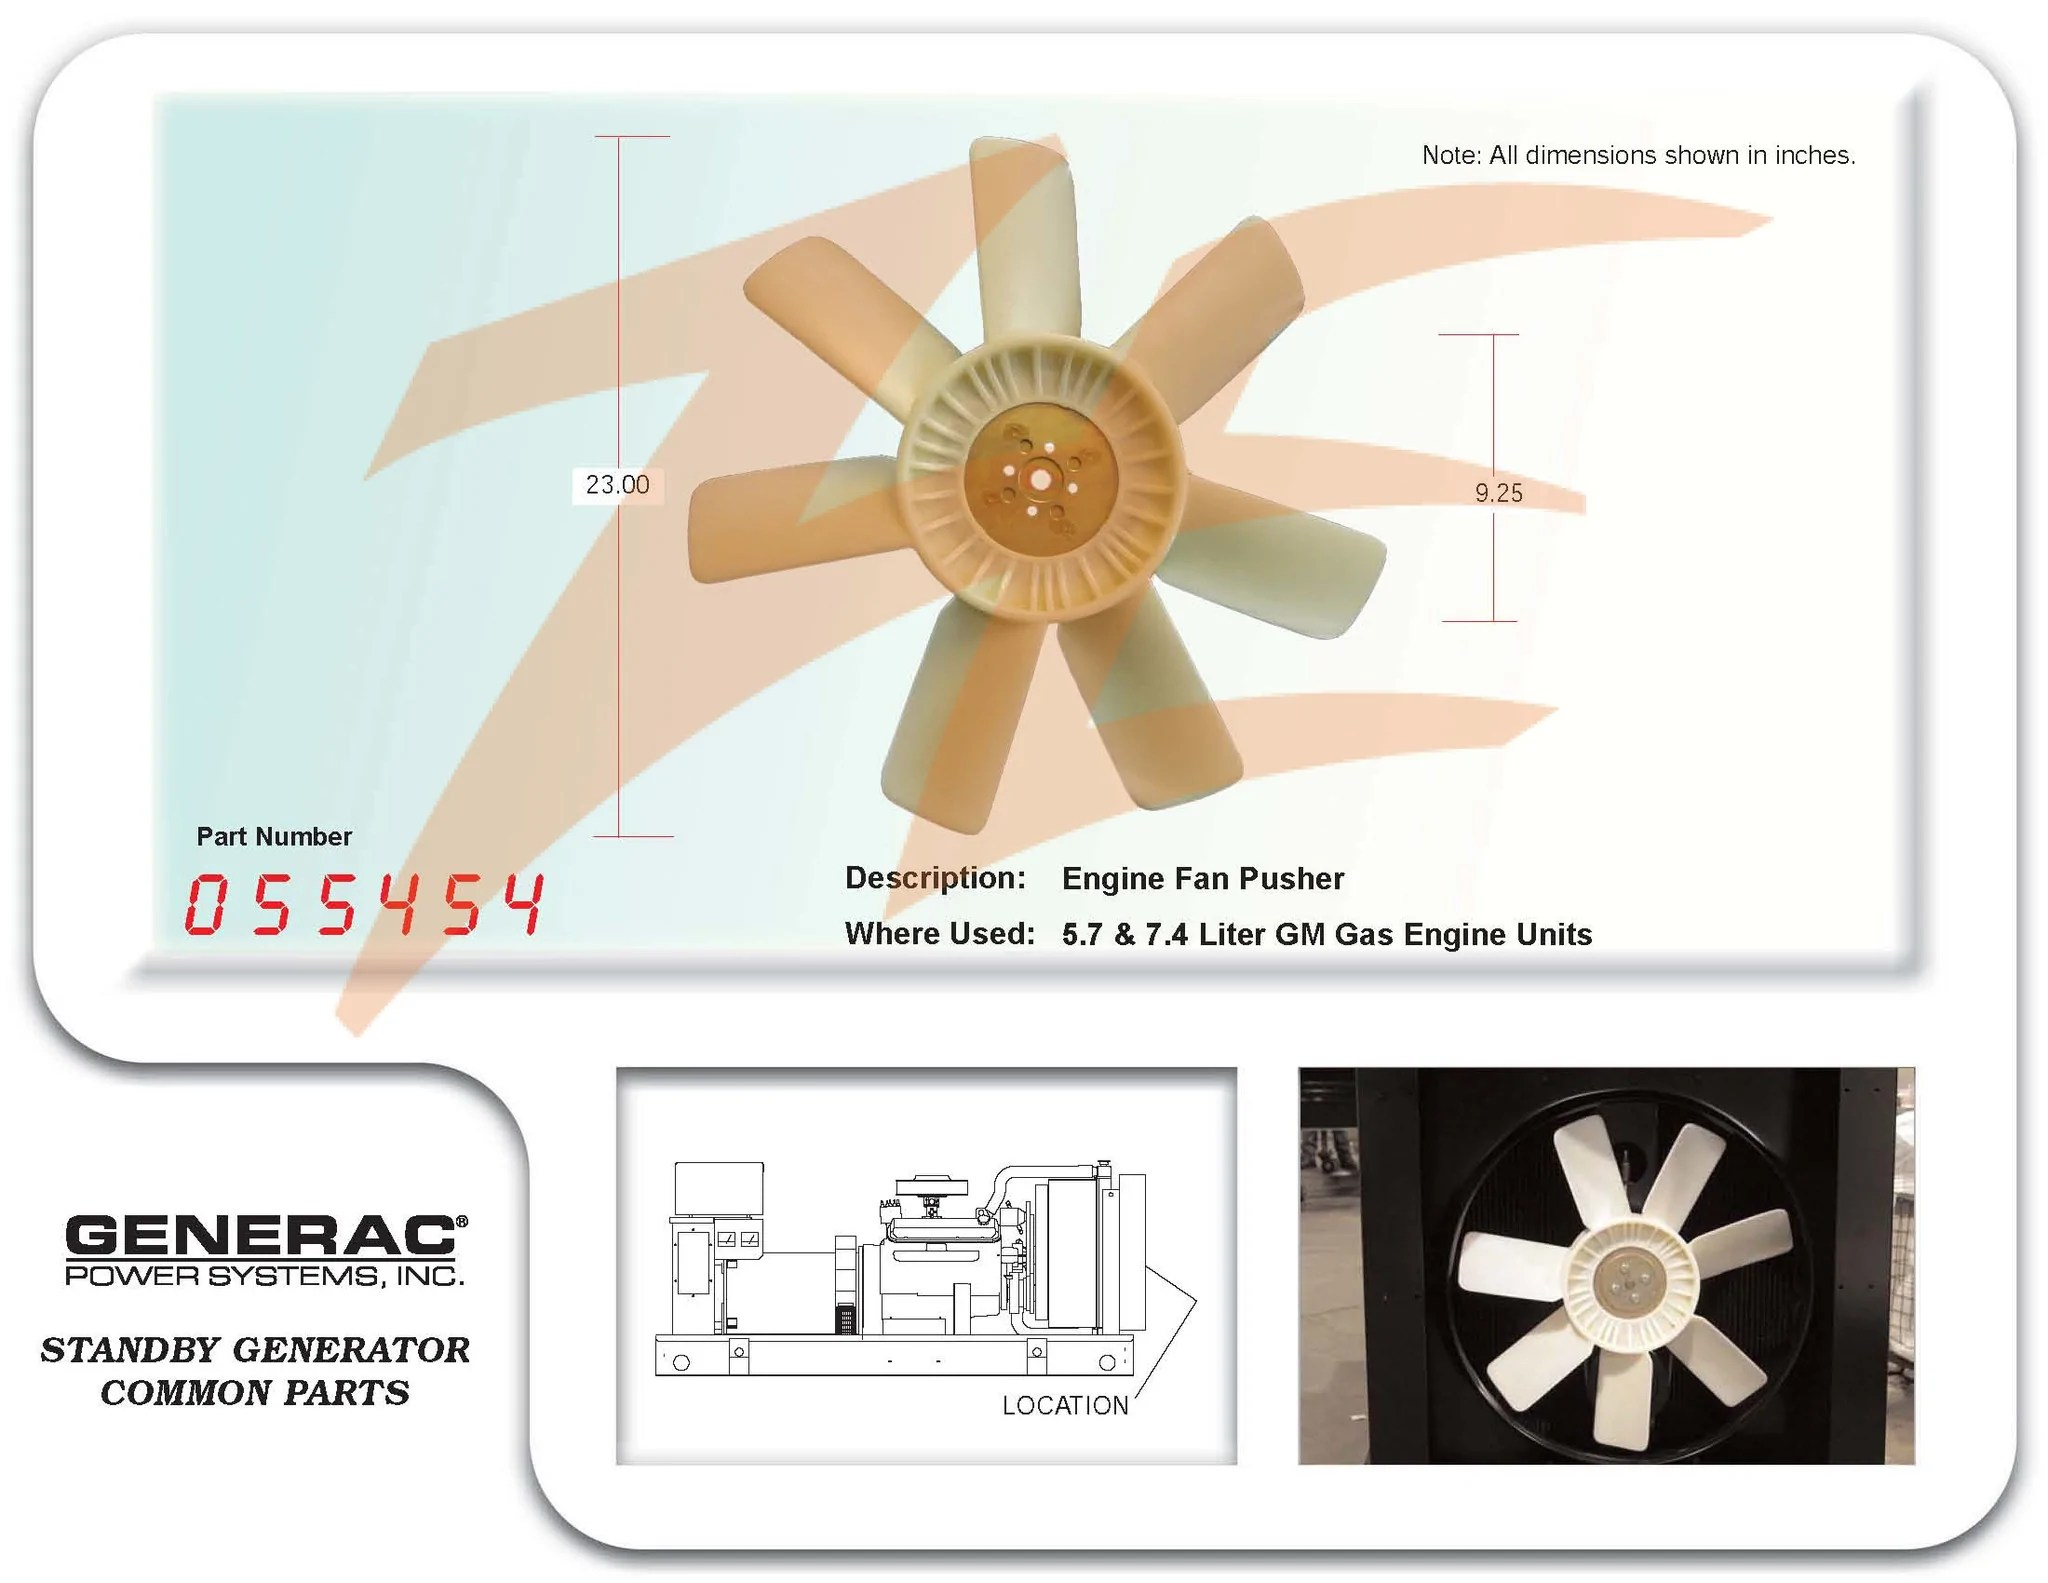 medium resolution of generac 055454 engine cooling fan pusher 5 7 7 4l